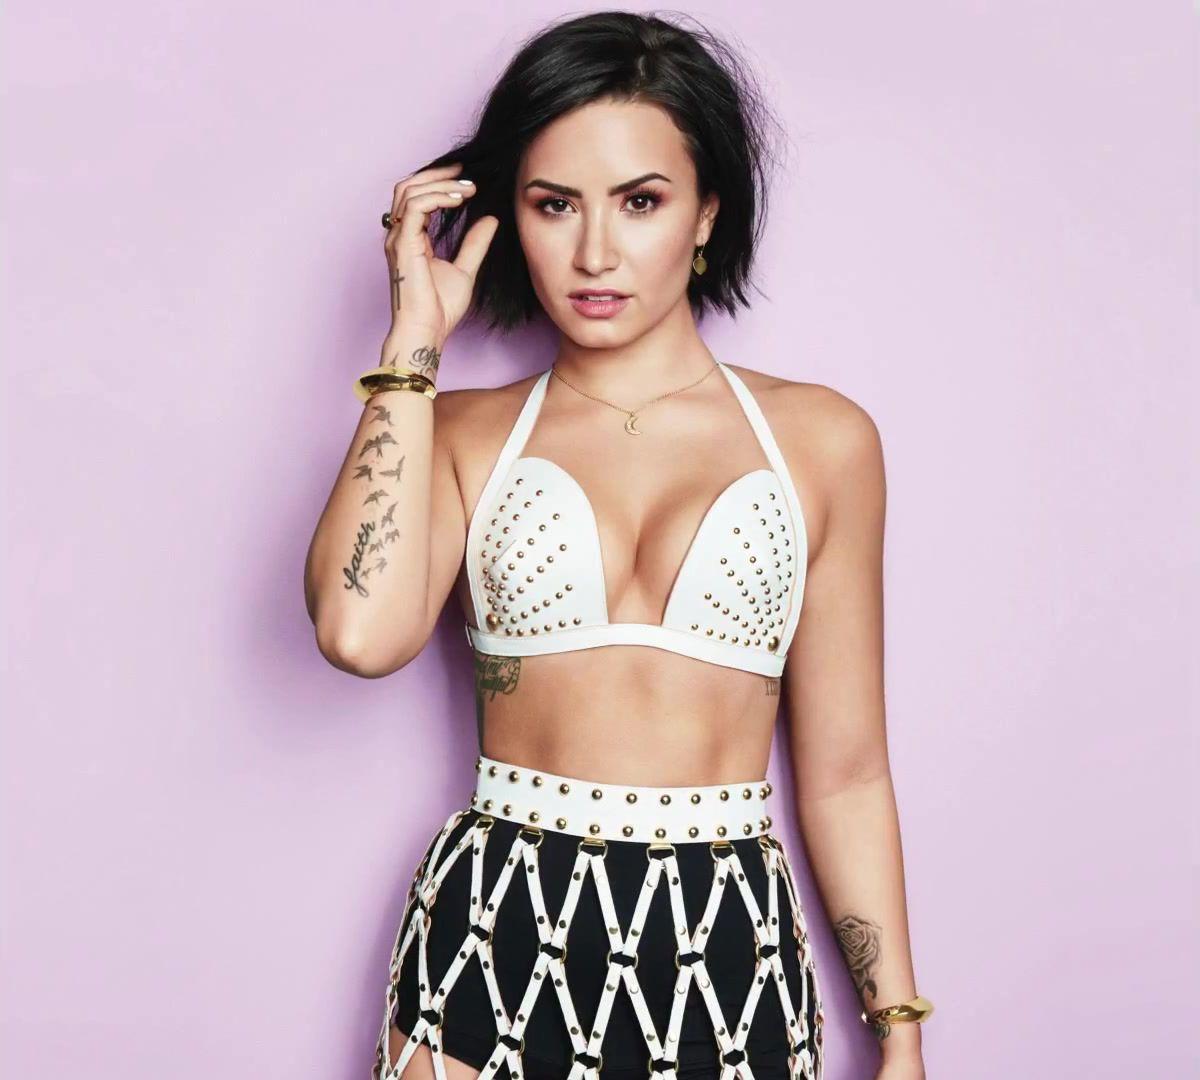 Demi Lovato http://sizlingpeople.com/wp-content/uploads/2017/02 ...